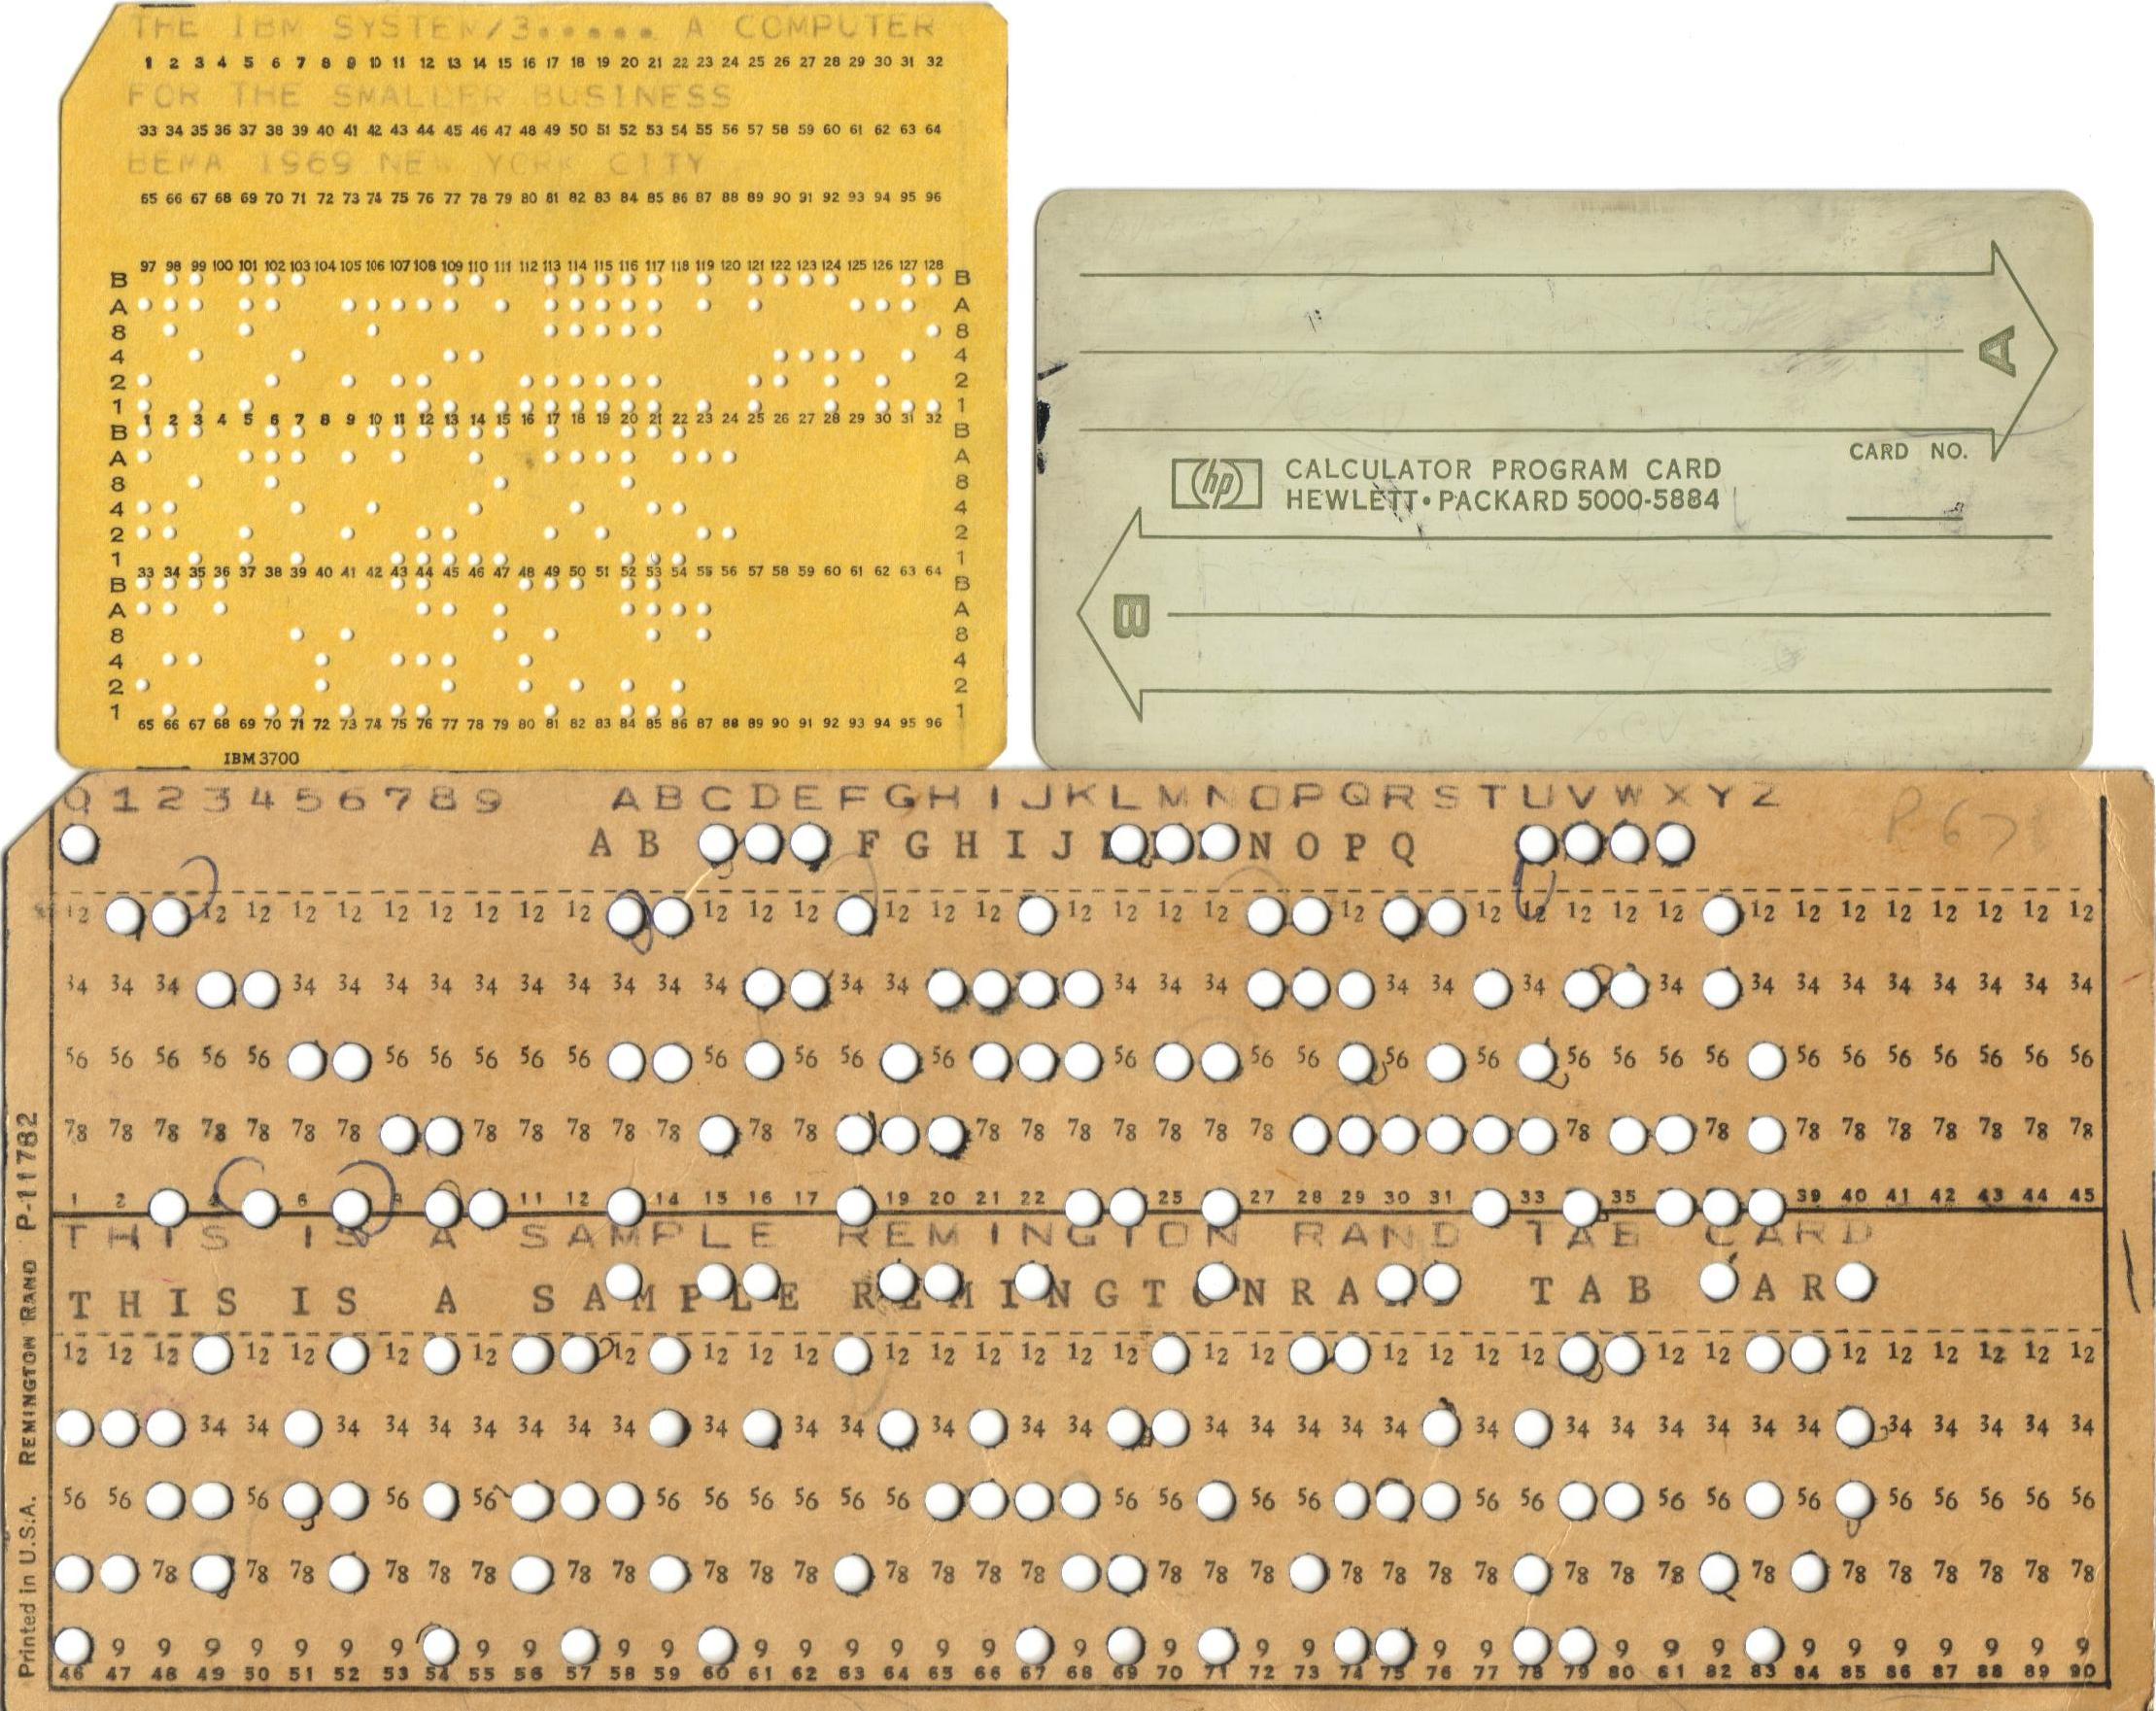 Best Punch Hewlett-packard Card Cards Computer images on Designspiration